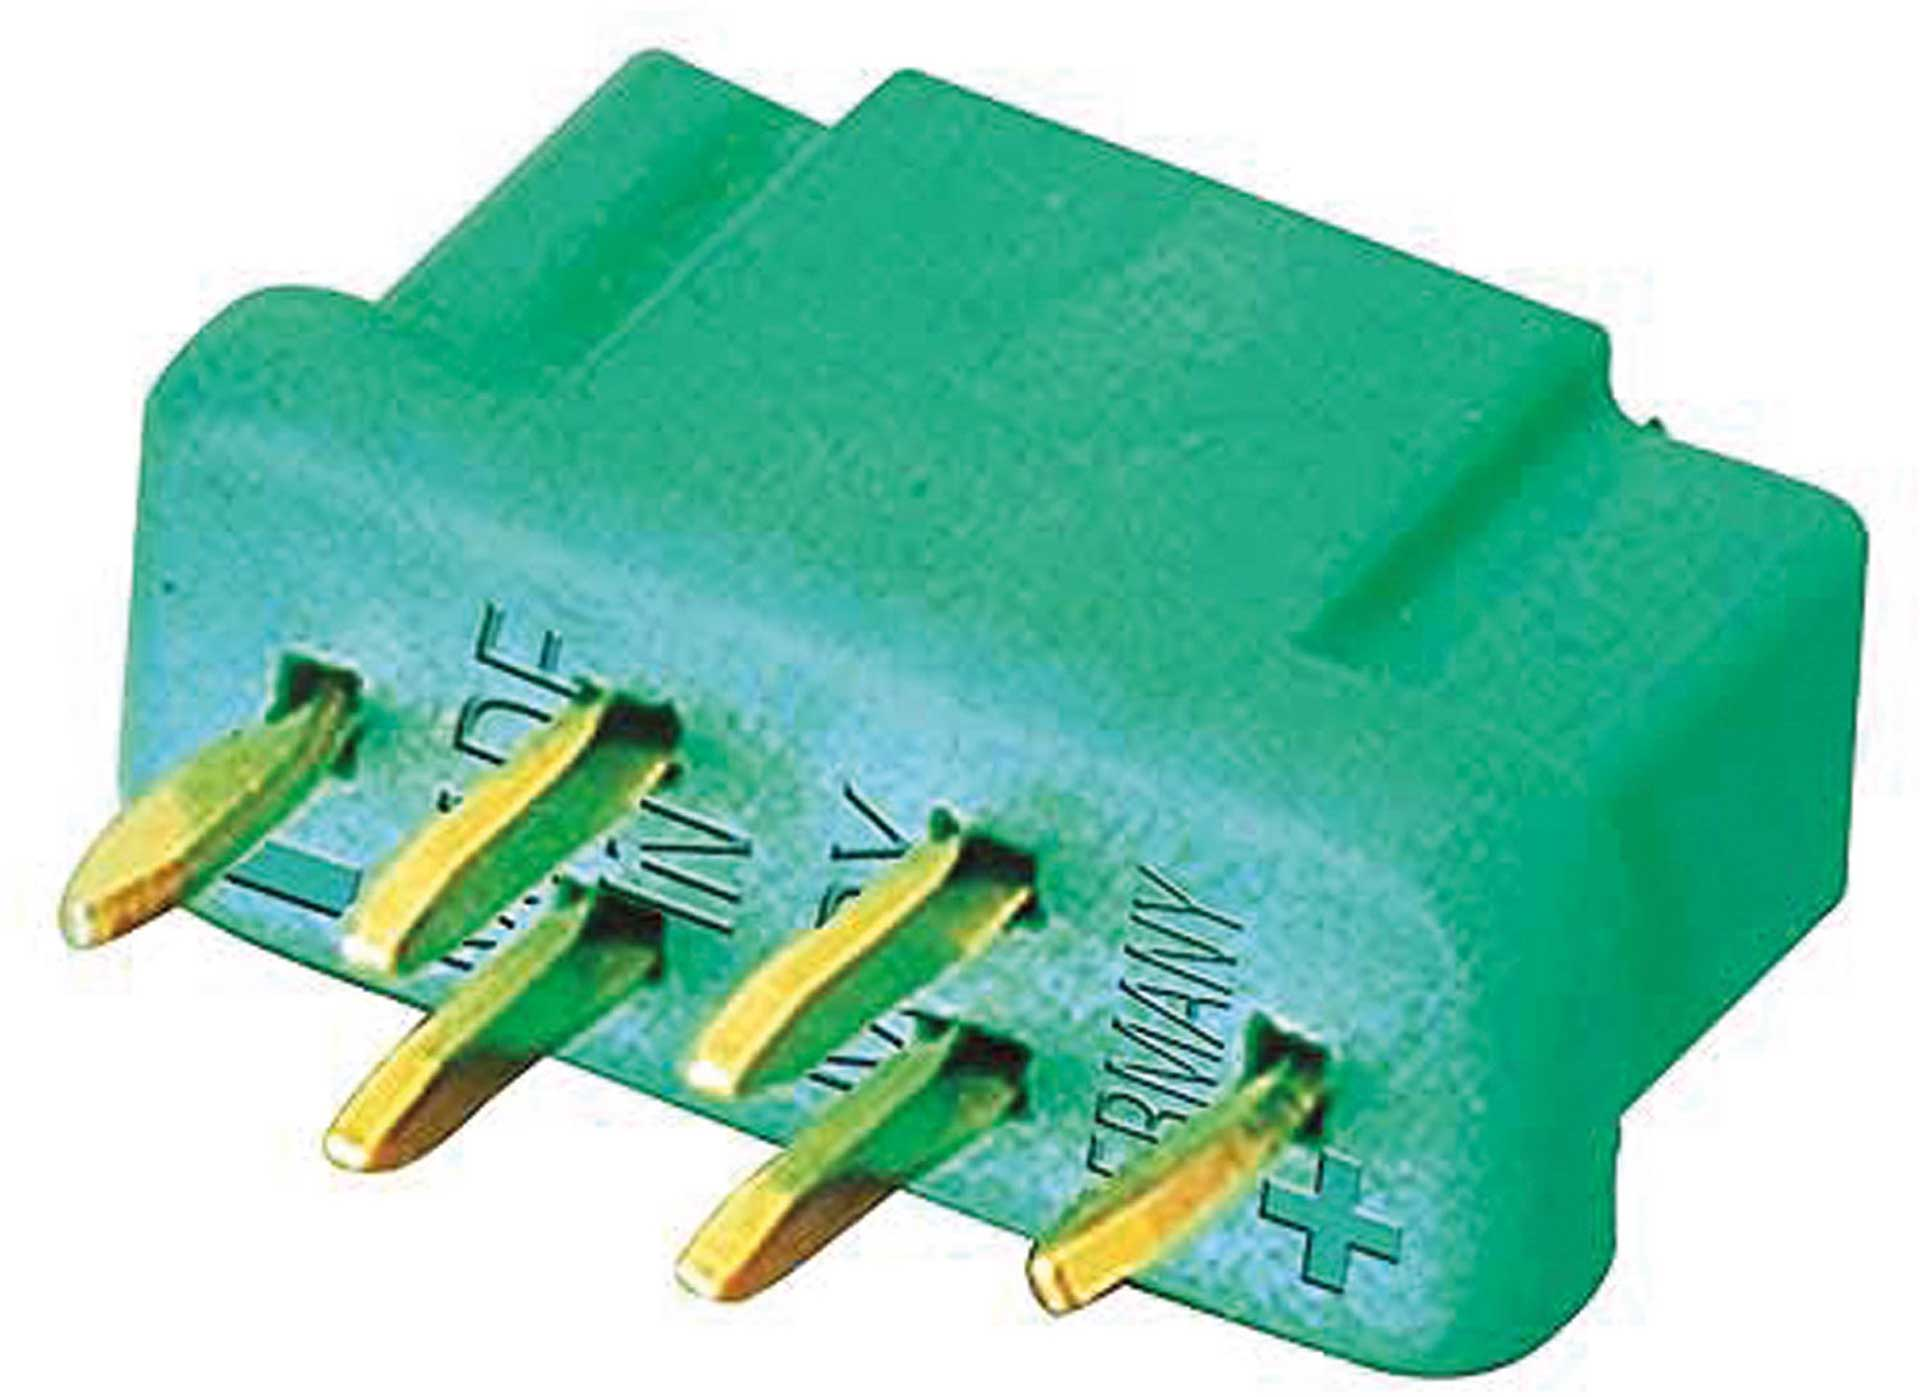 MULTIPLEX High current sockets M6-50 50 (100) A 3p